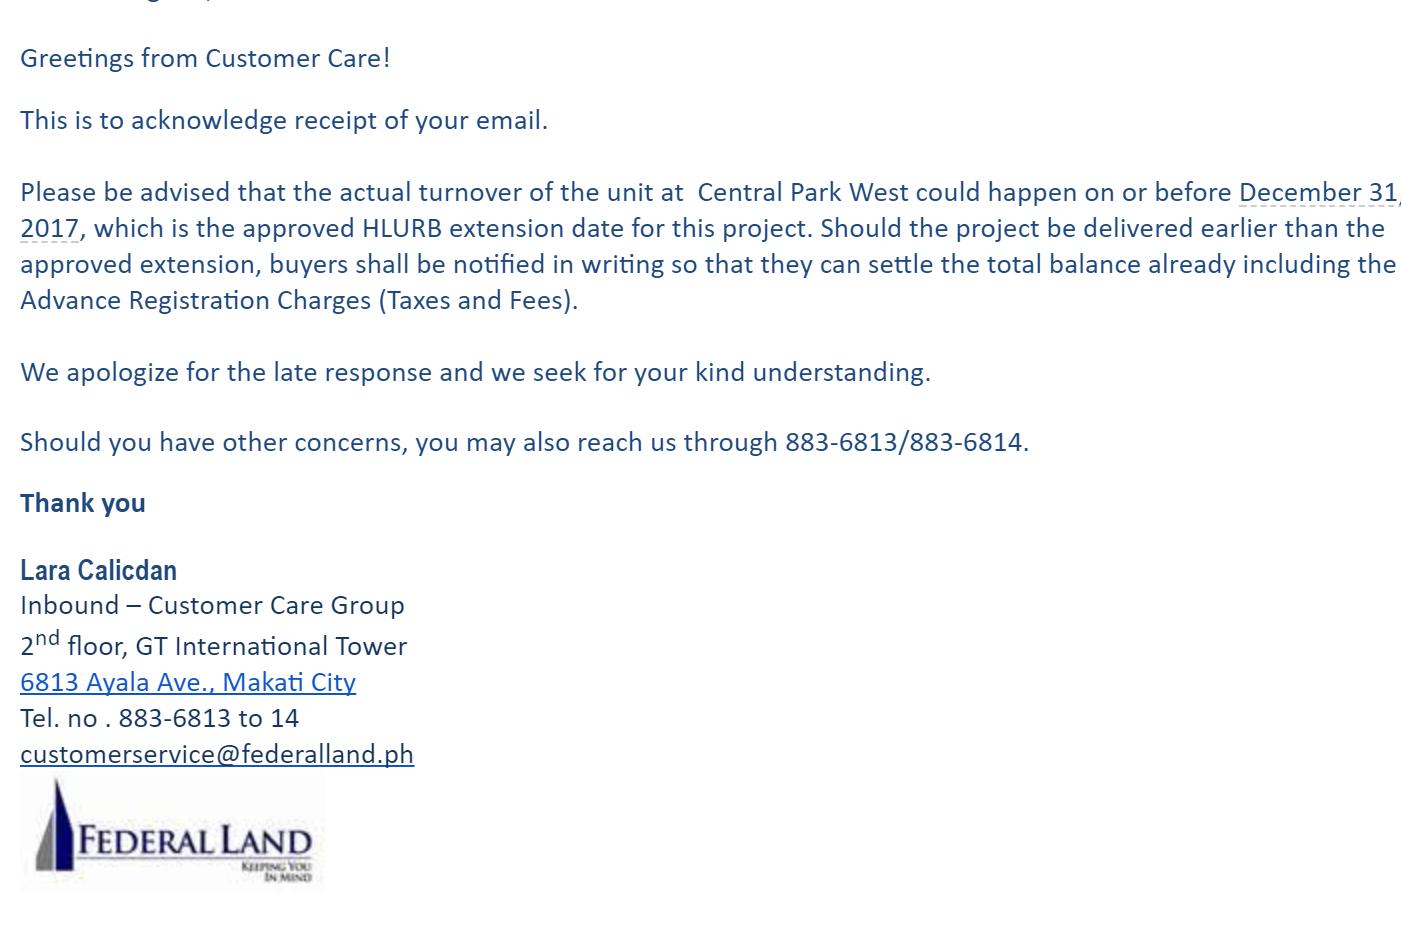 GRAND CENTRAL PARK | Central Park West [33F|res] - Page 38